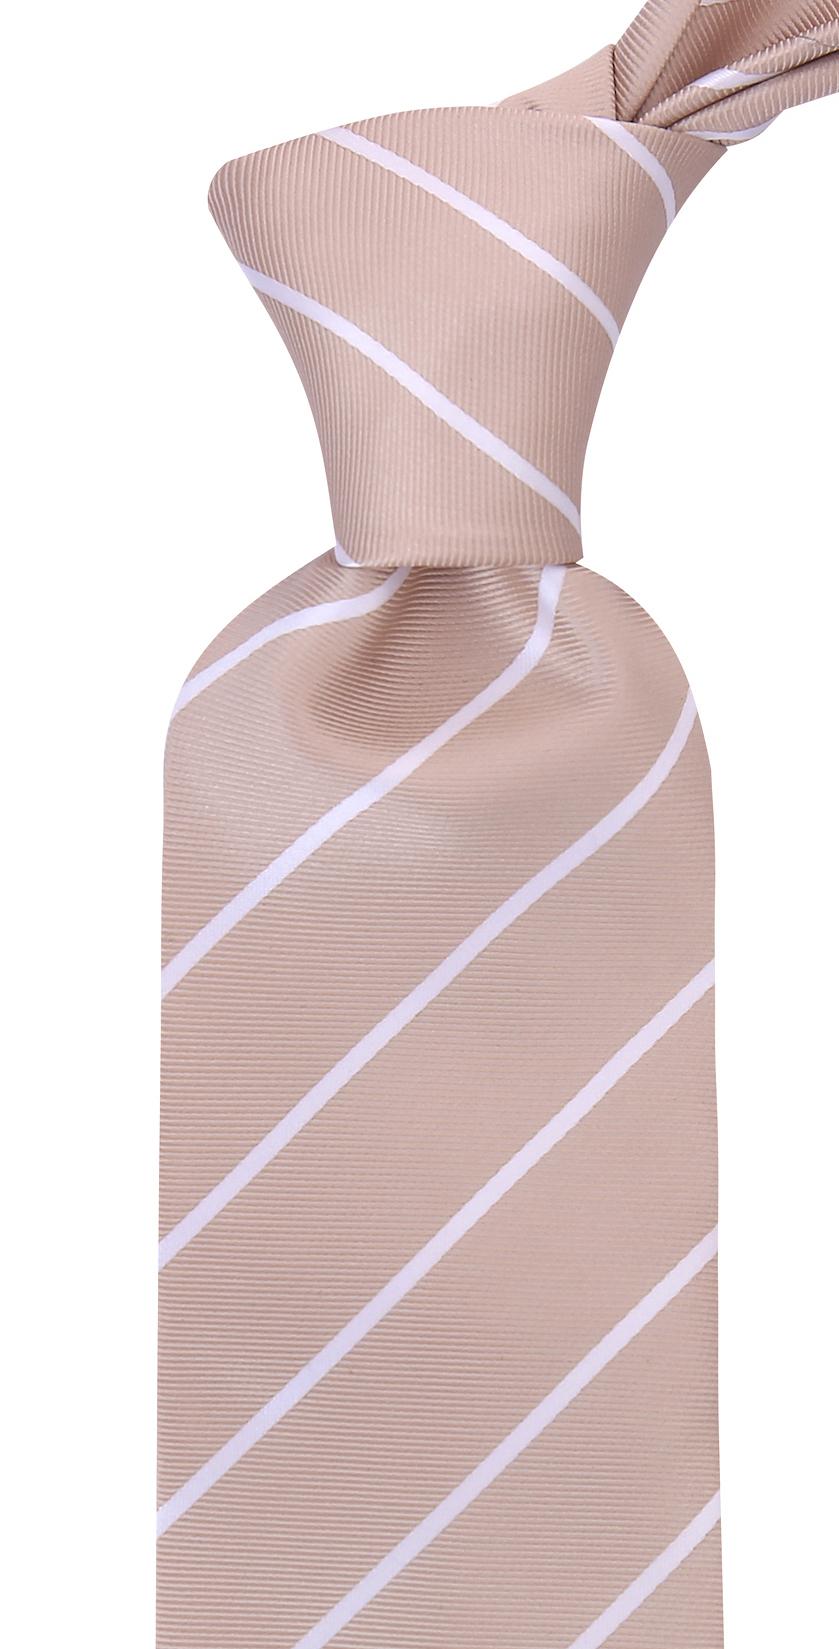 Scott-Allan-Mens-Necktie-Pencil-Striped-Mens-Tie thumbnail 6